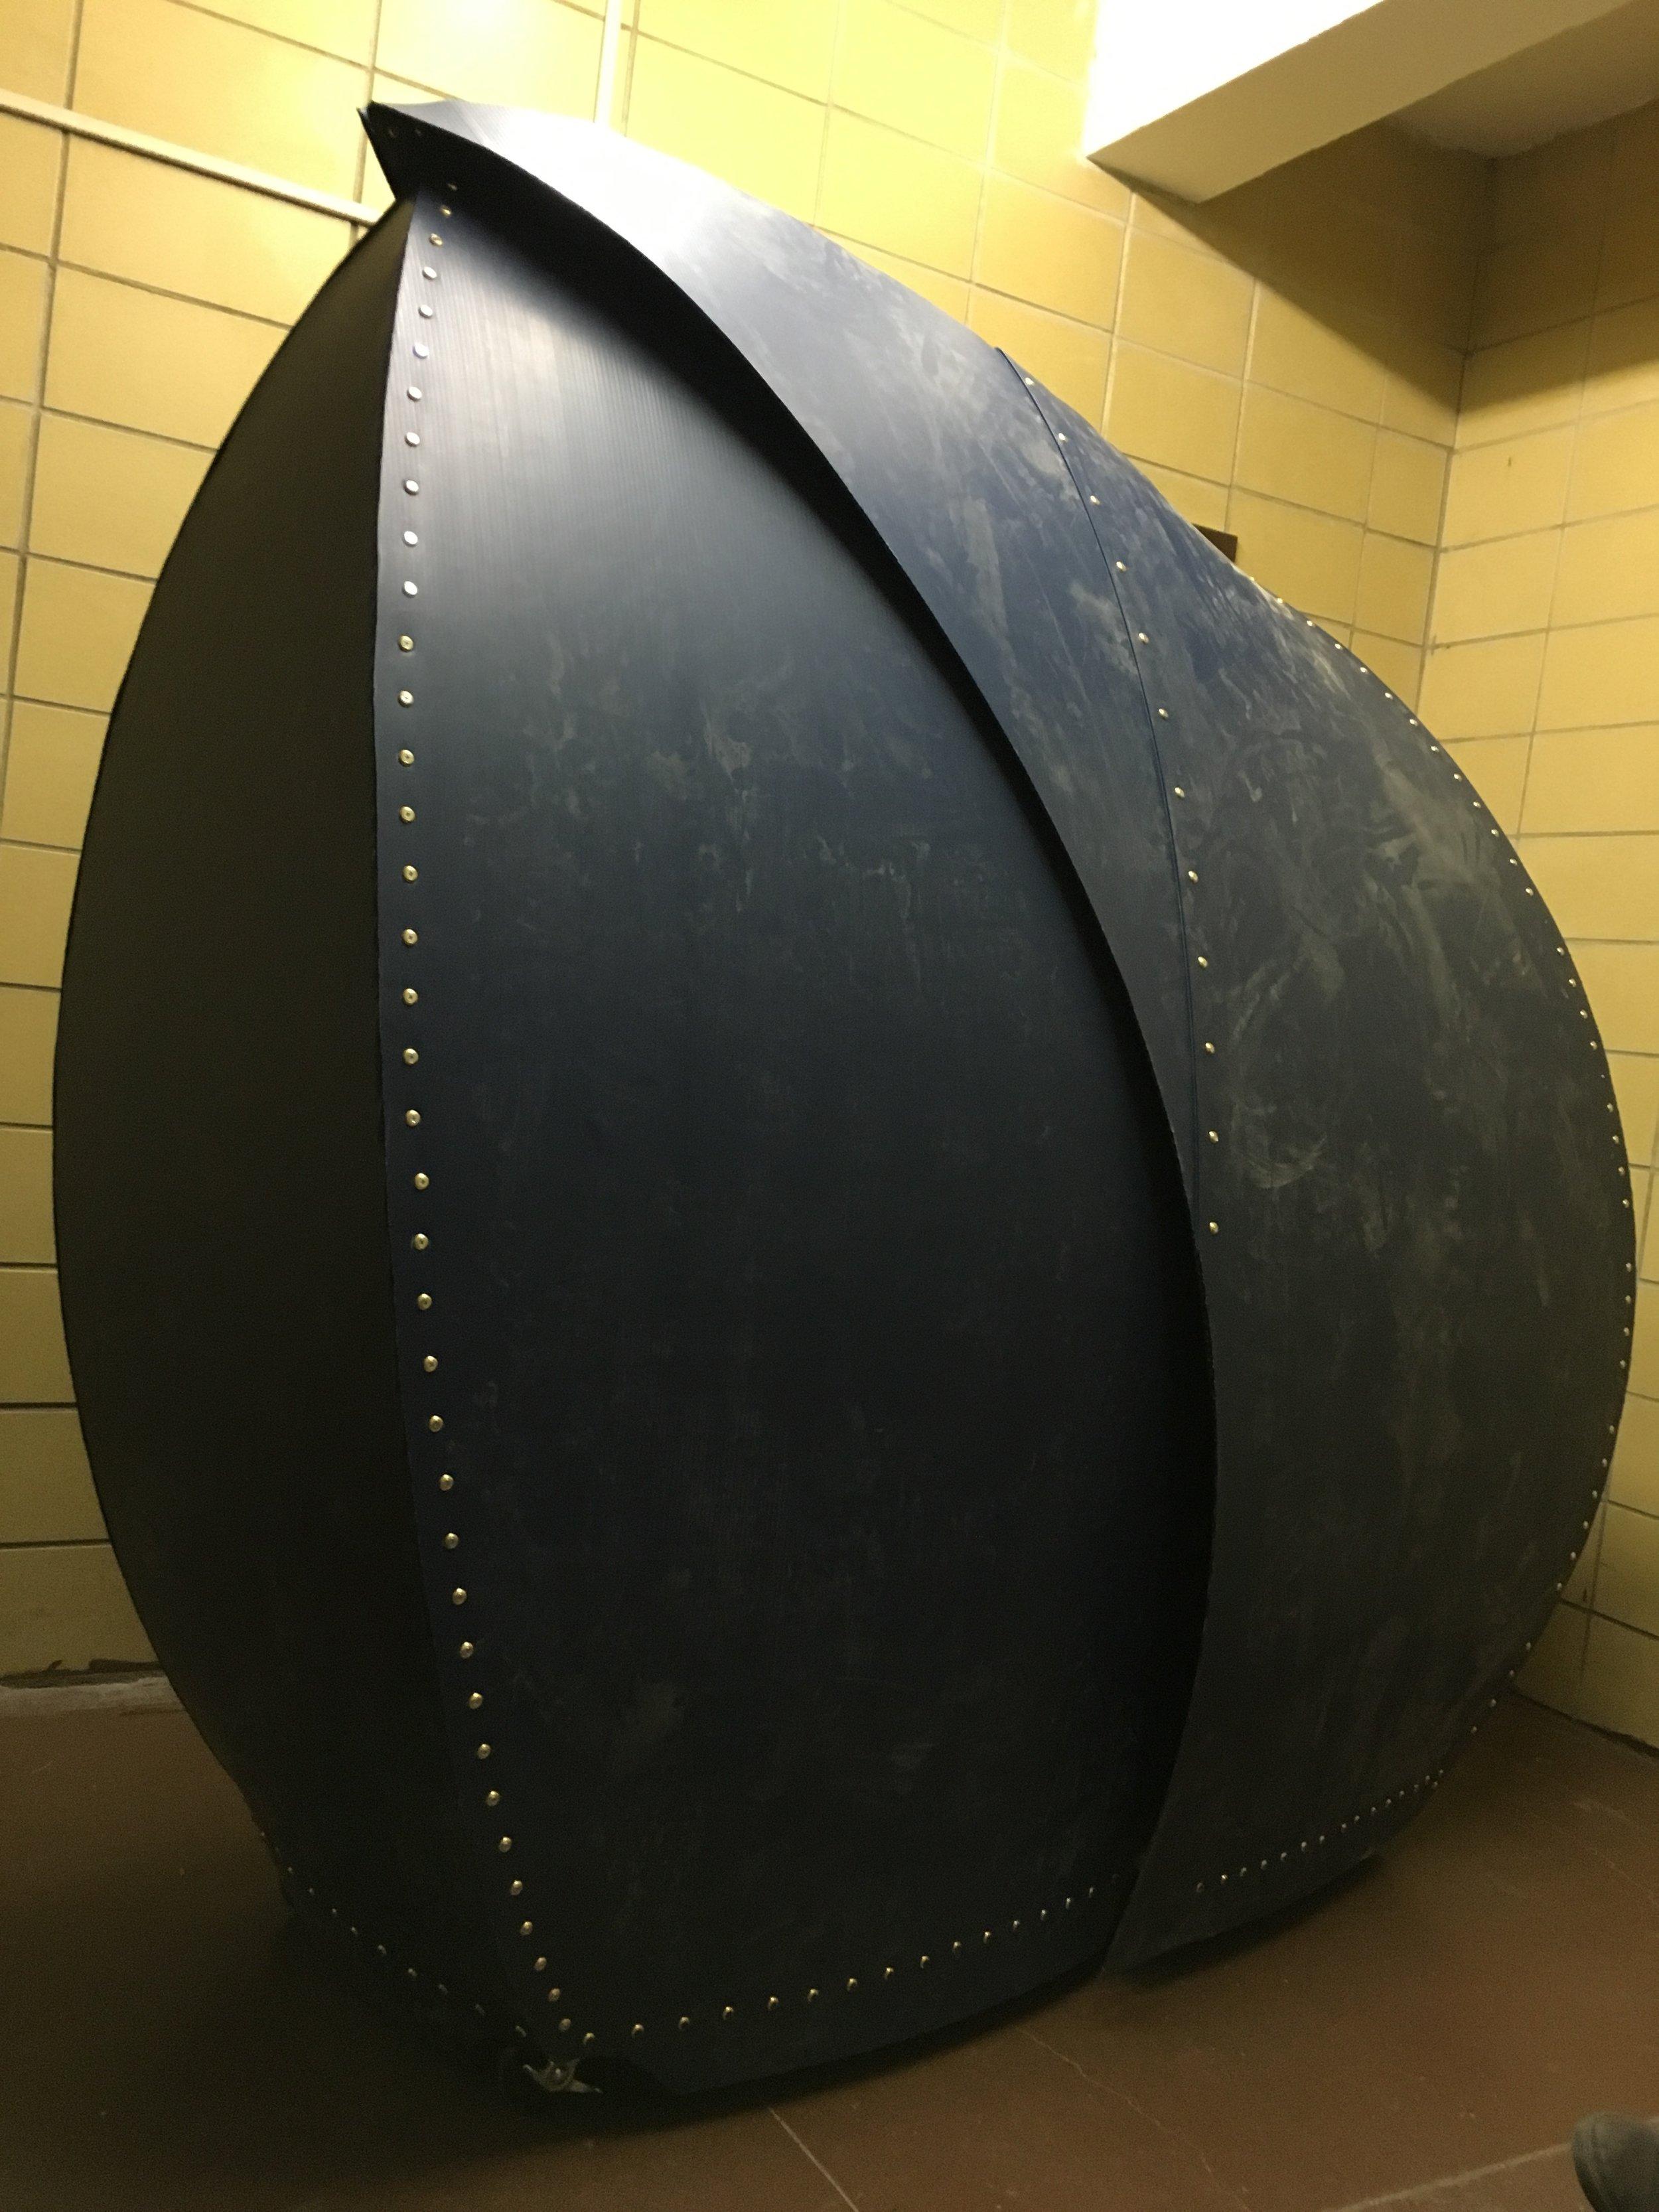 Space Pod in progress